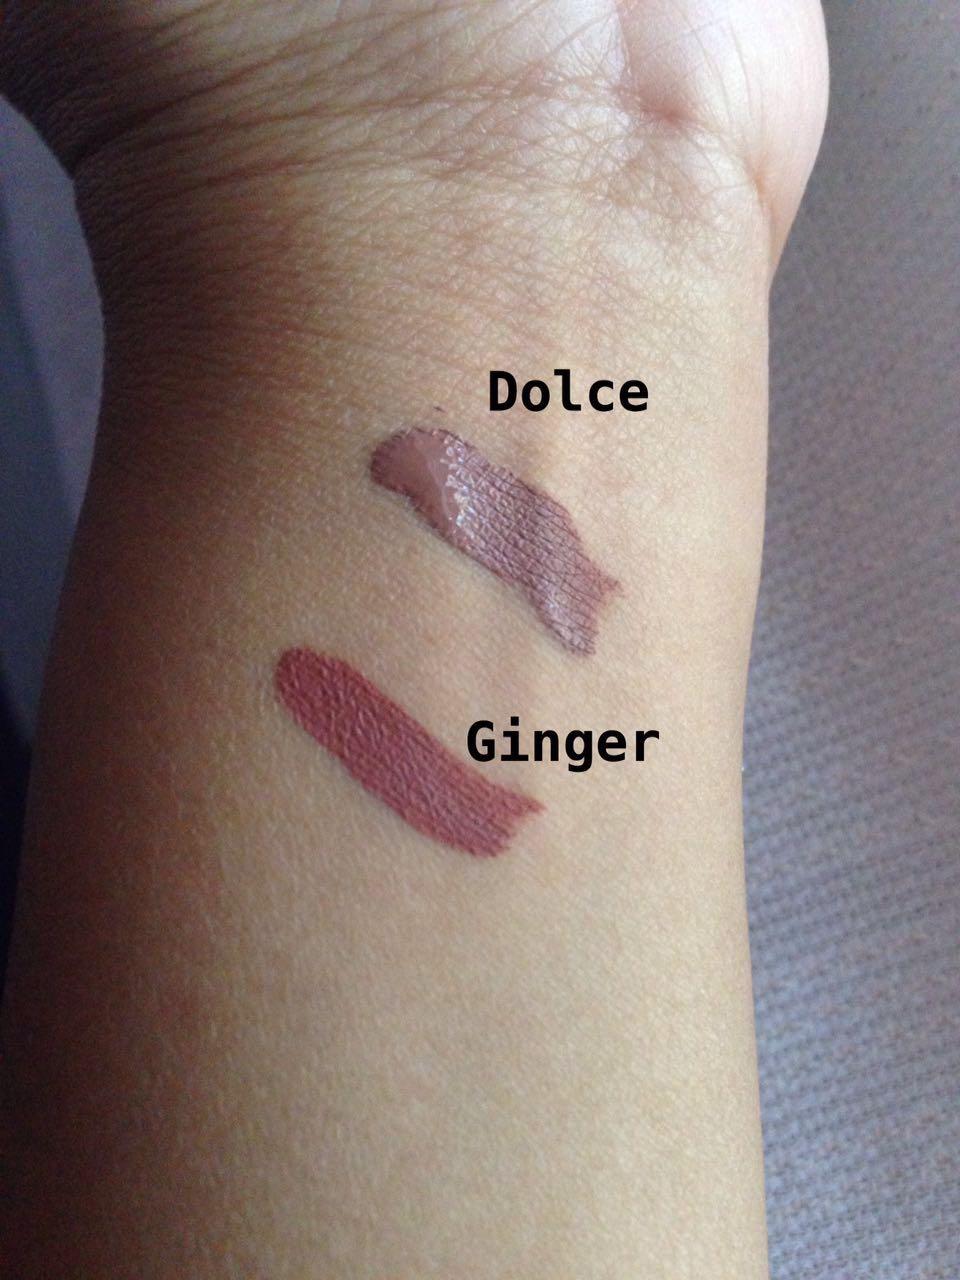 Jual Kylie Matte Liquid Lipstick Dolce K: Kylie Dolce Vs Kylie Ginger Matte Lips